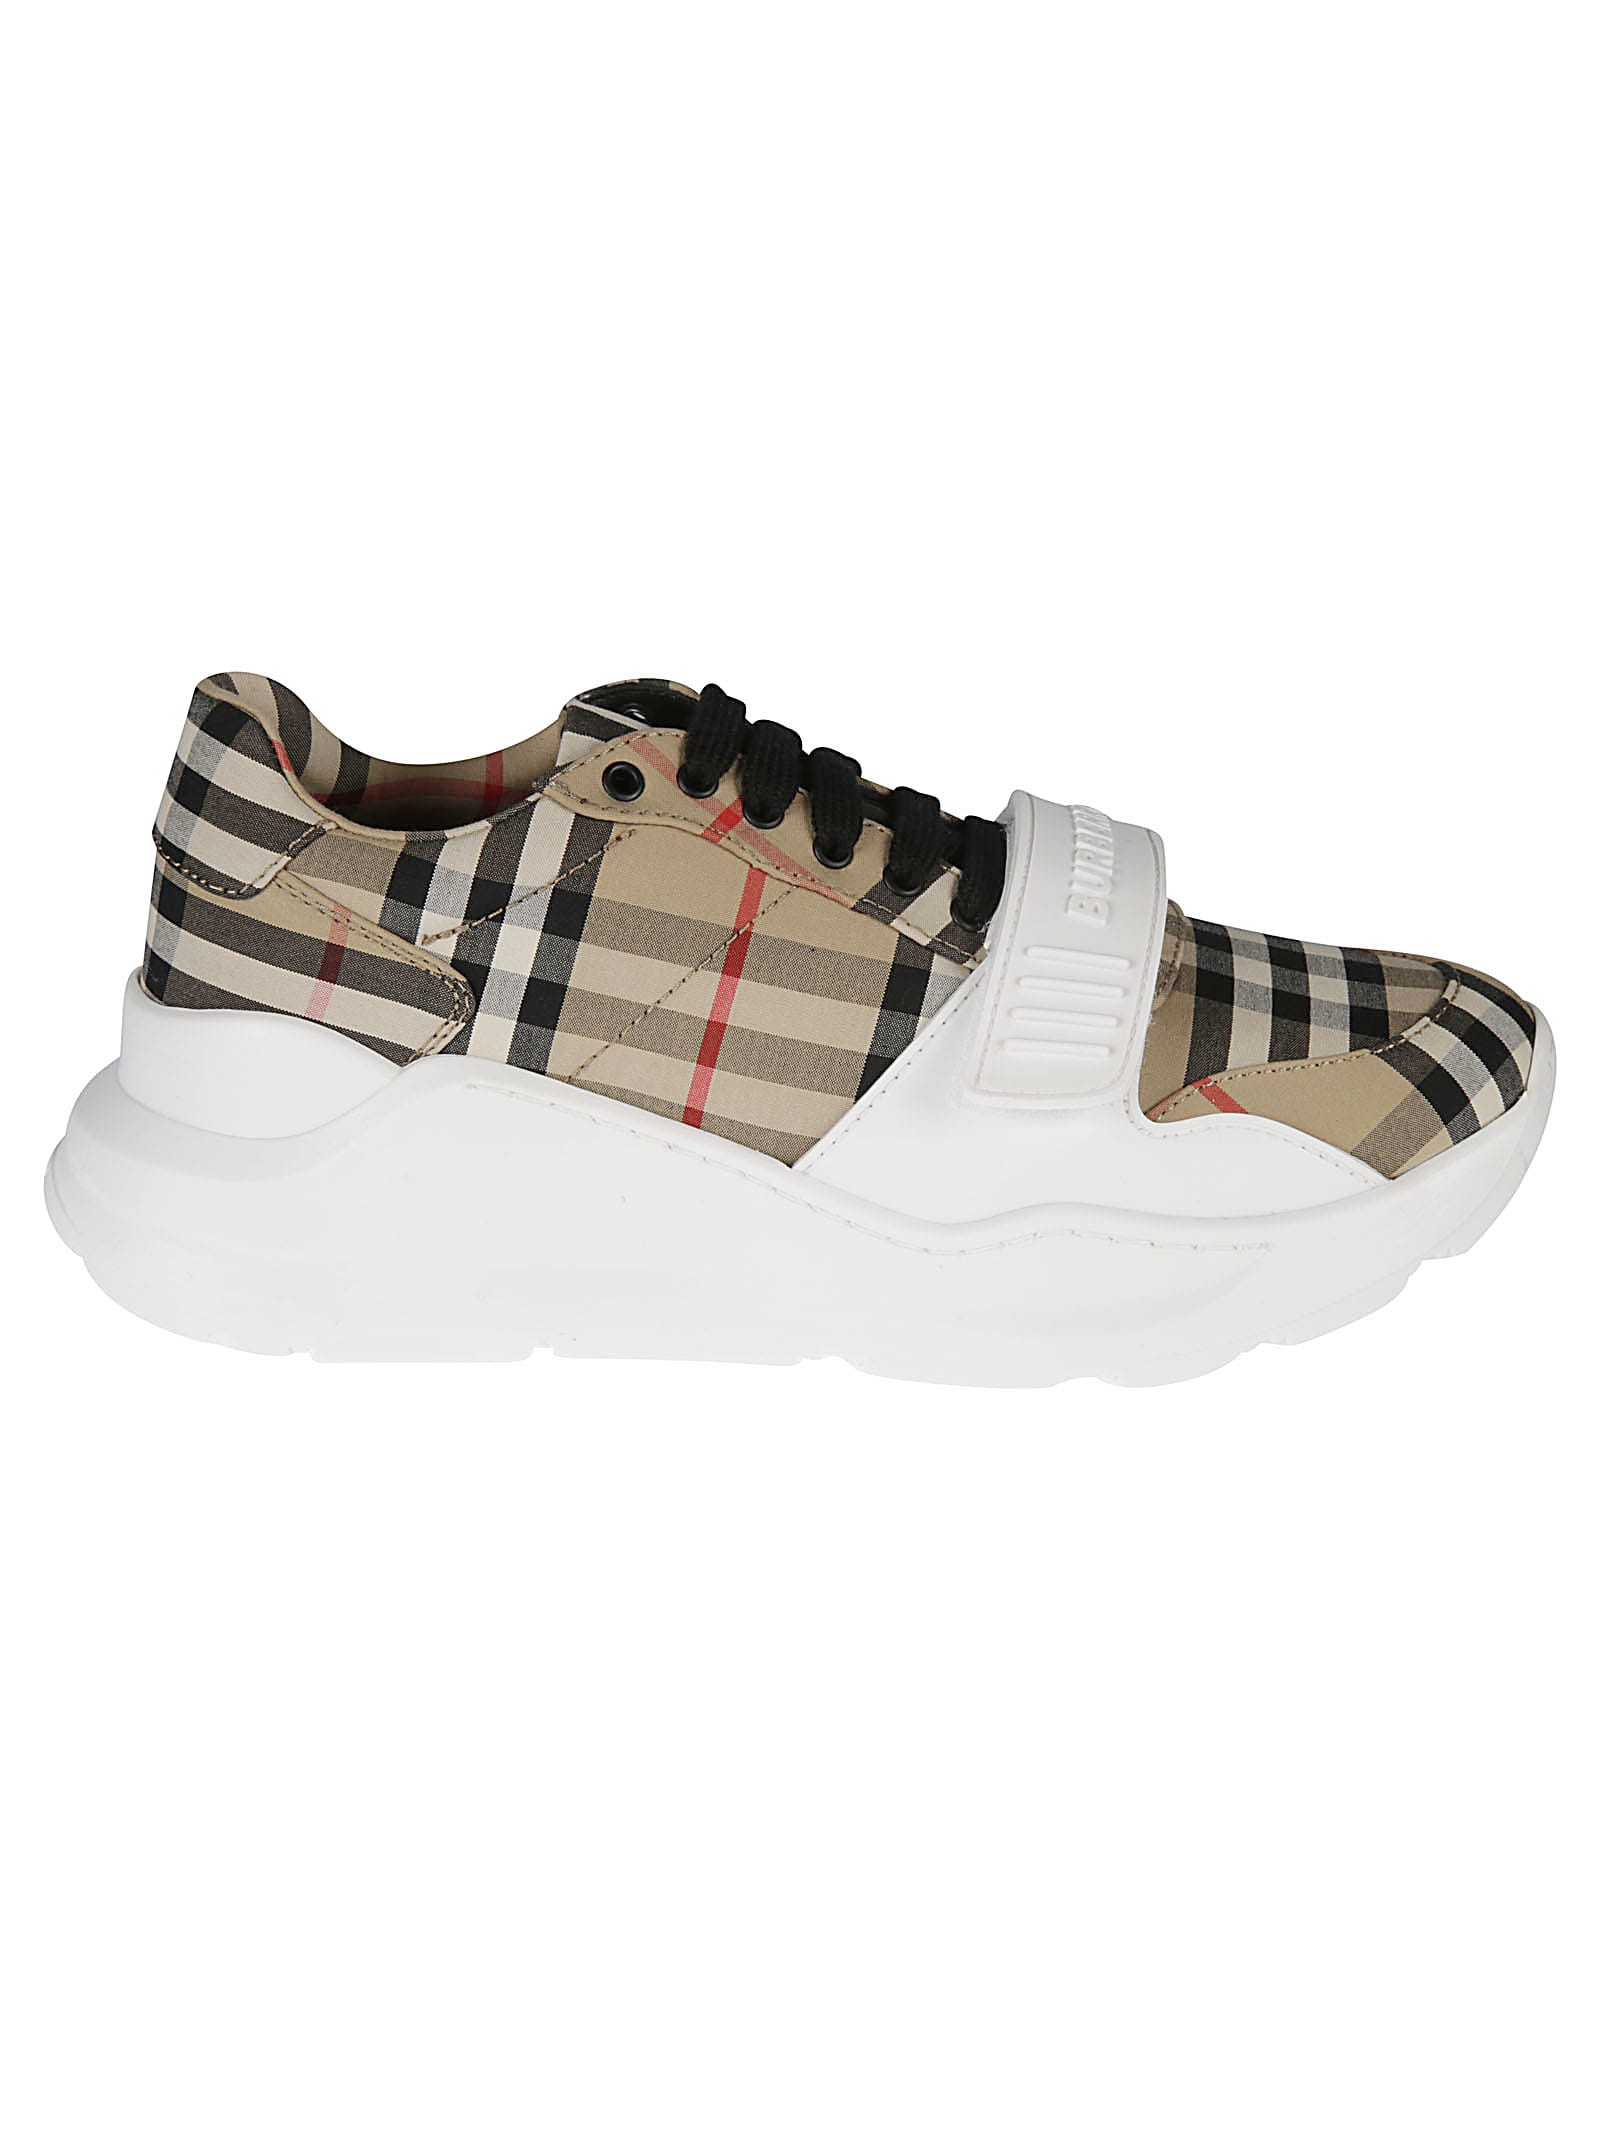 Burberry Regis Low Sneakers